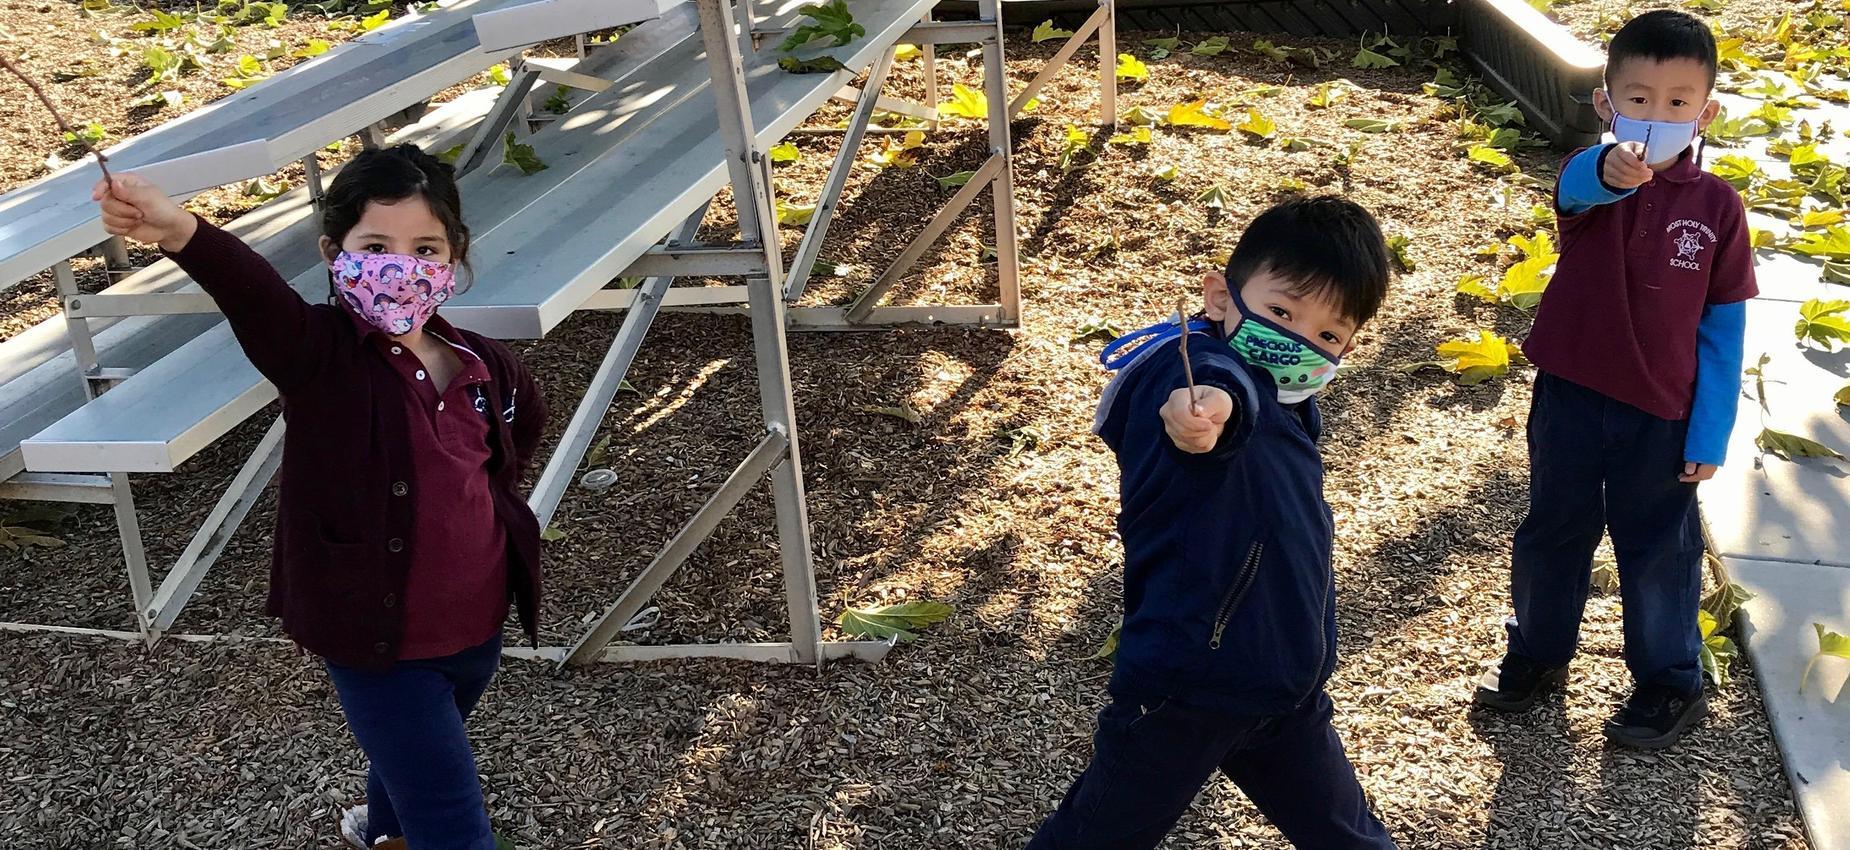 Kindergarteners with Wands